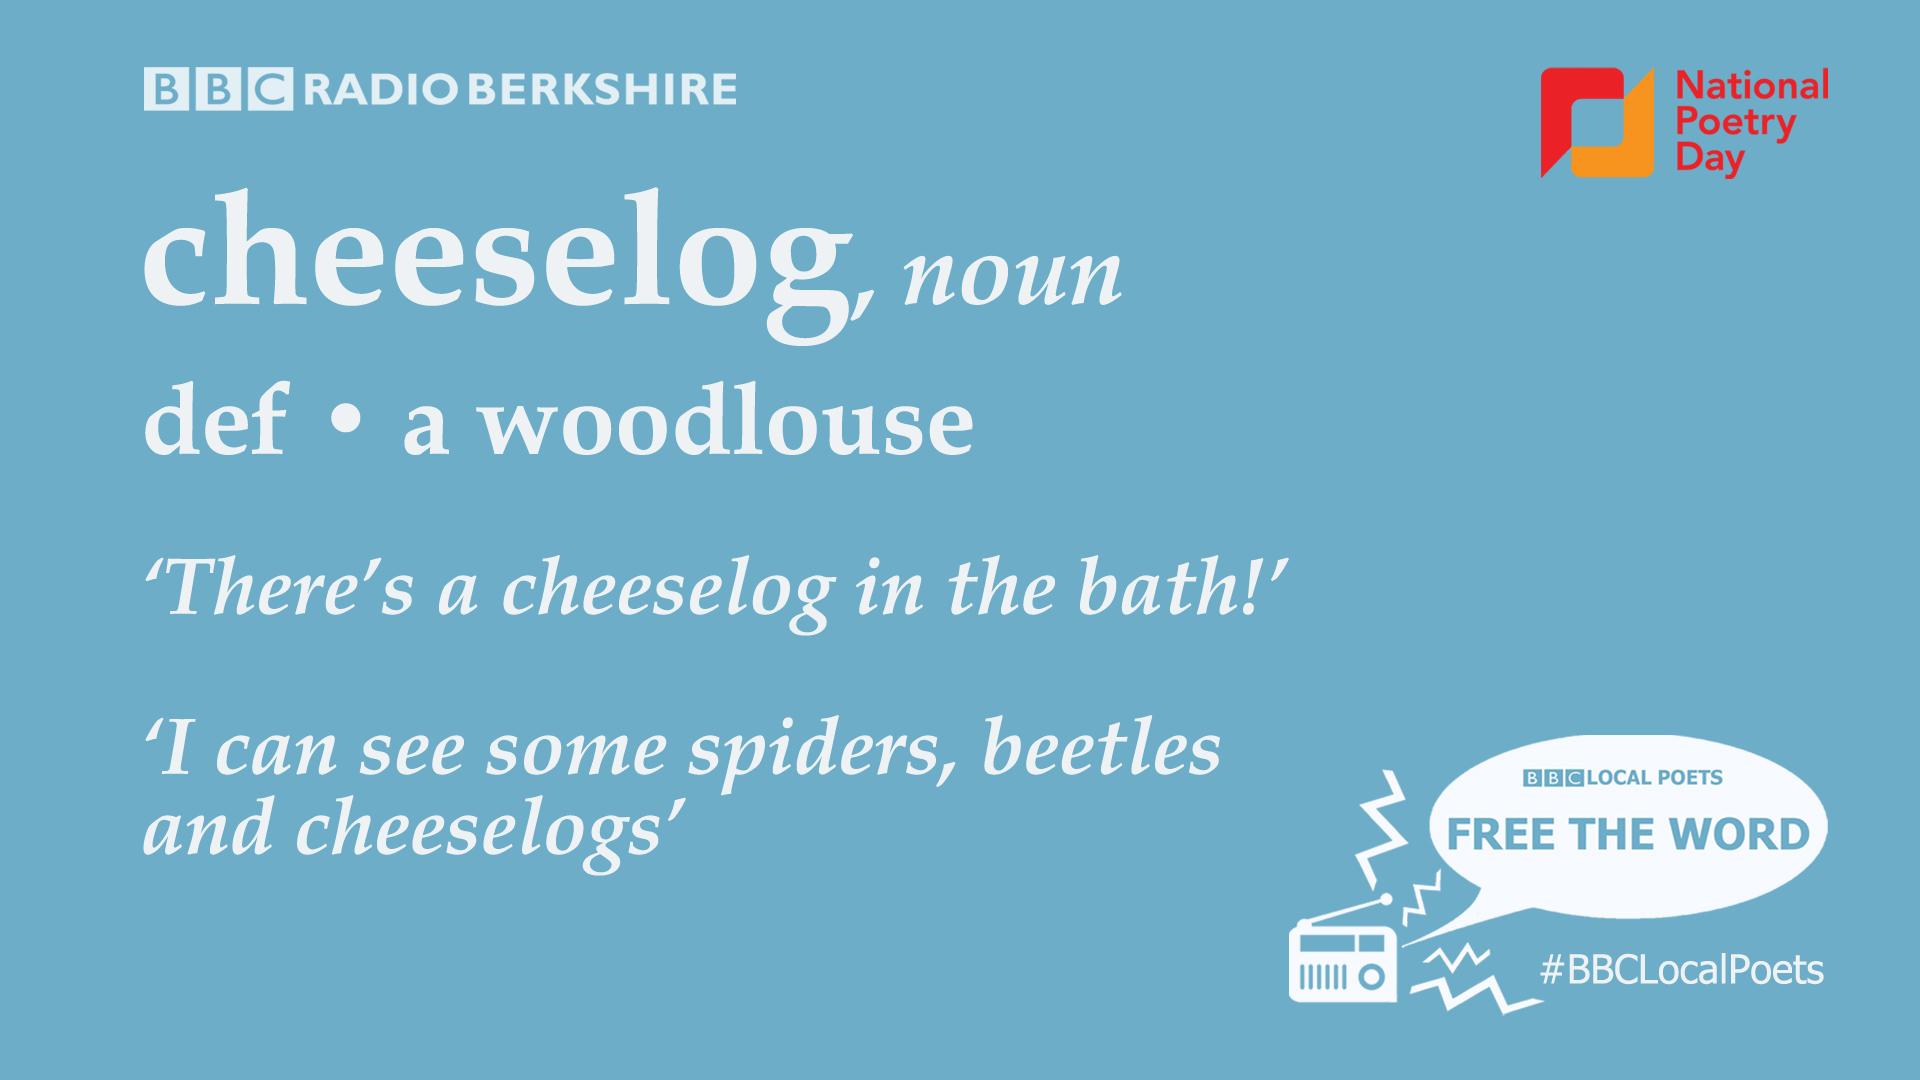 Cheeselog was chosen by BBC Radio Berkshire listeners.